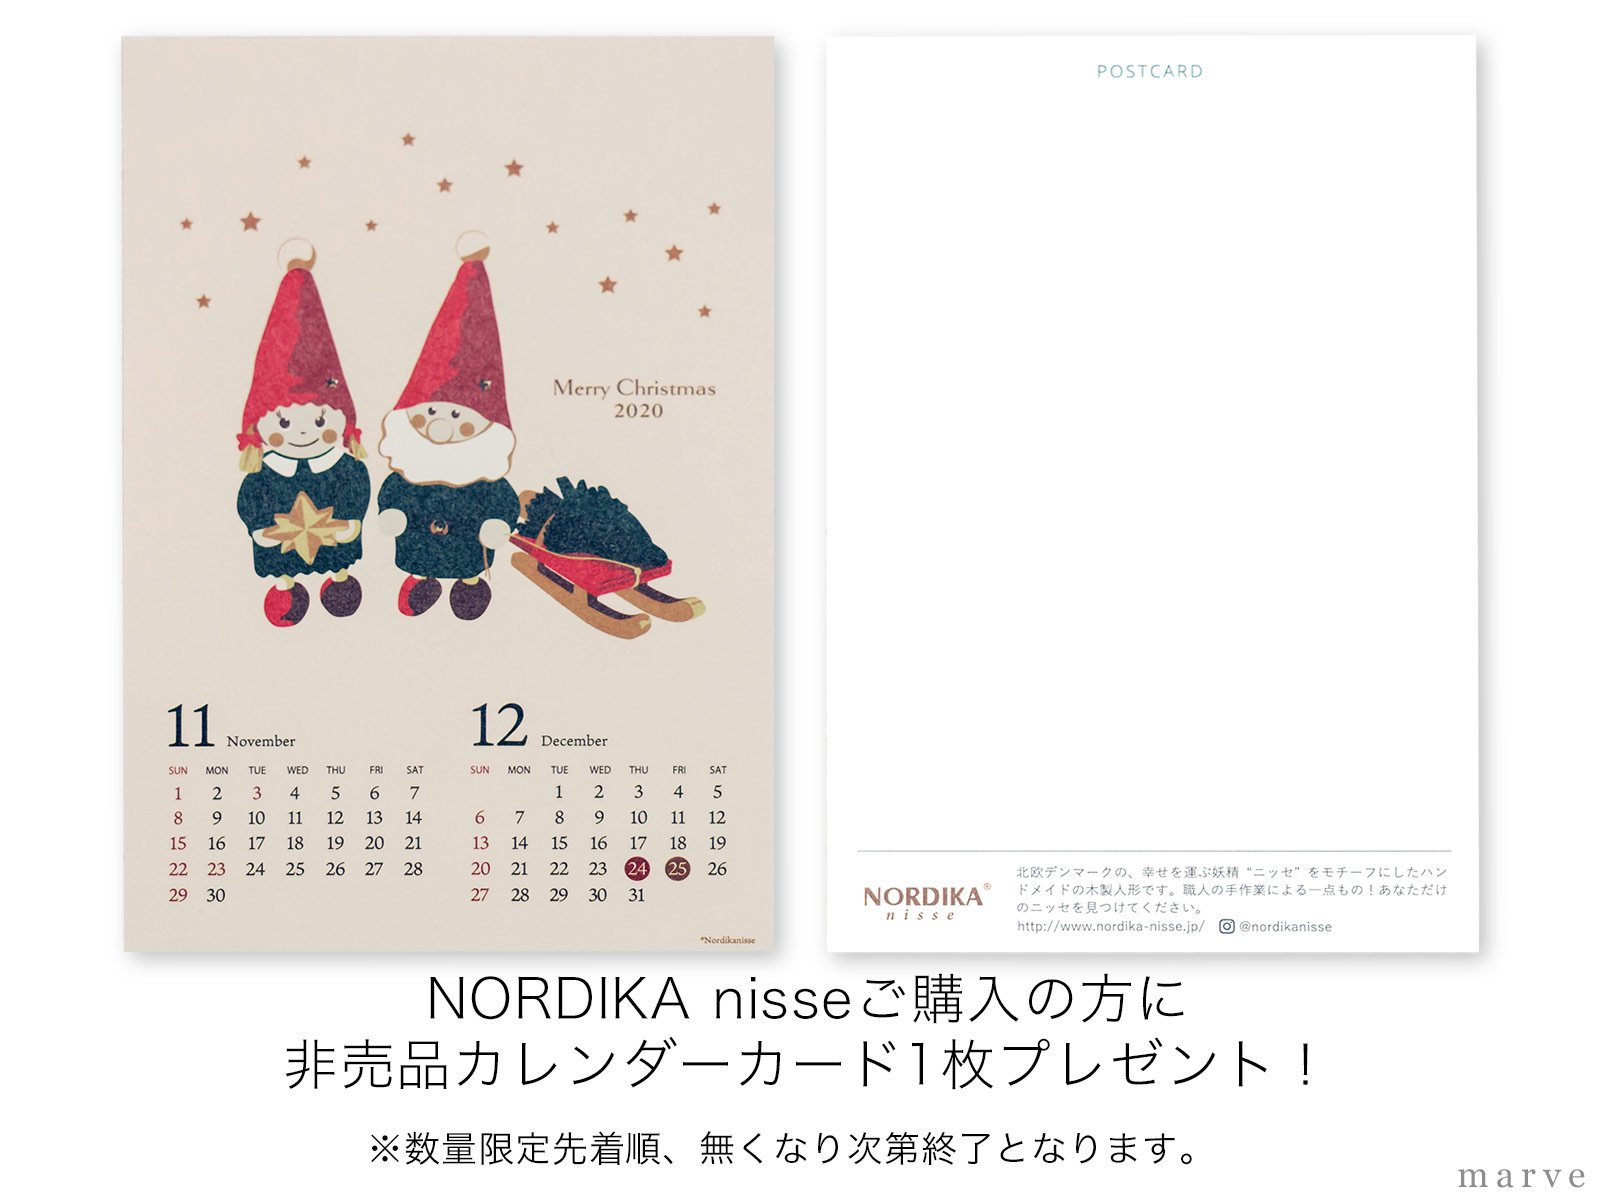 NORDIKA design ニッセドール 「リースを持った女の子 ホーム」<img class='new_mark_img2' src='https://img.shop-pro.jp/img/new/icons1.gif' style='border:none;display:inline;margin:0px;padding:0px;width:auto;' />